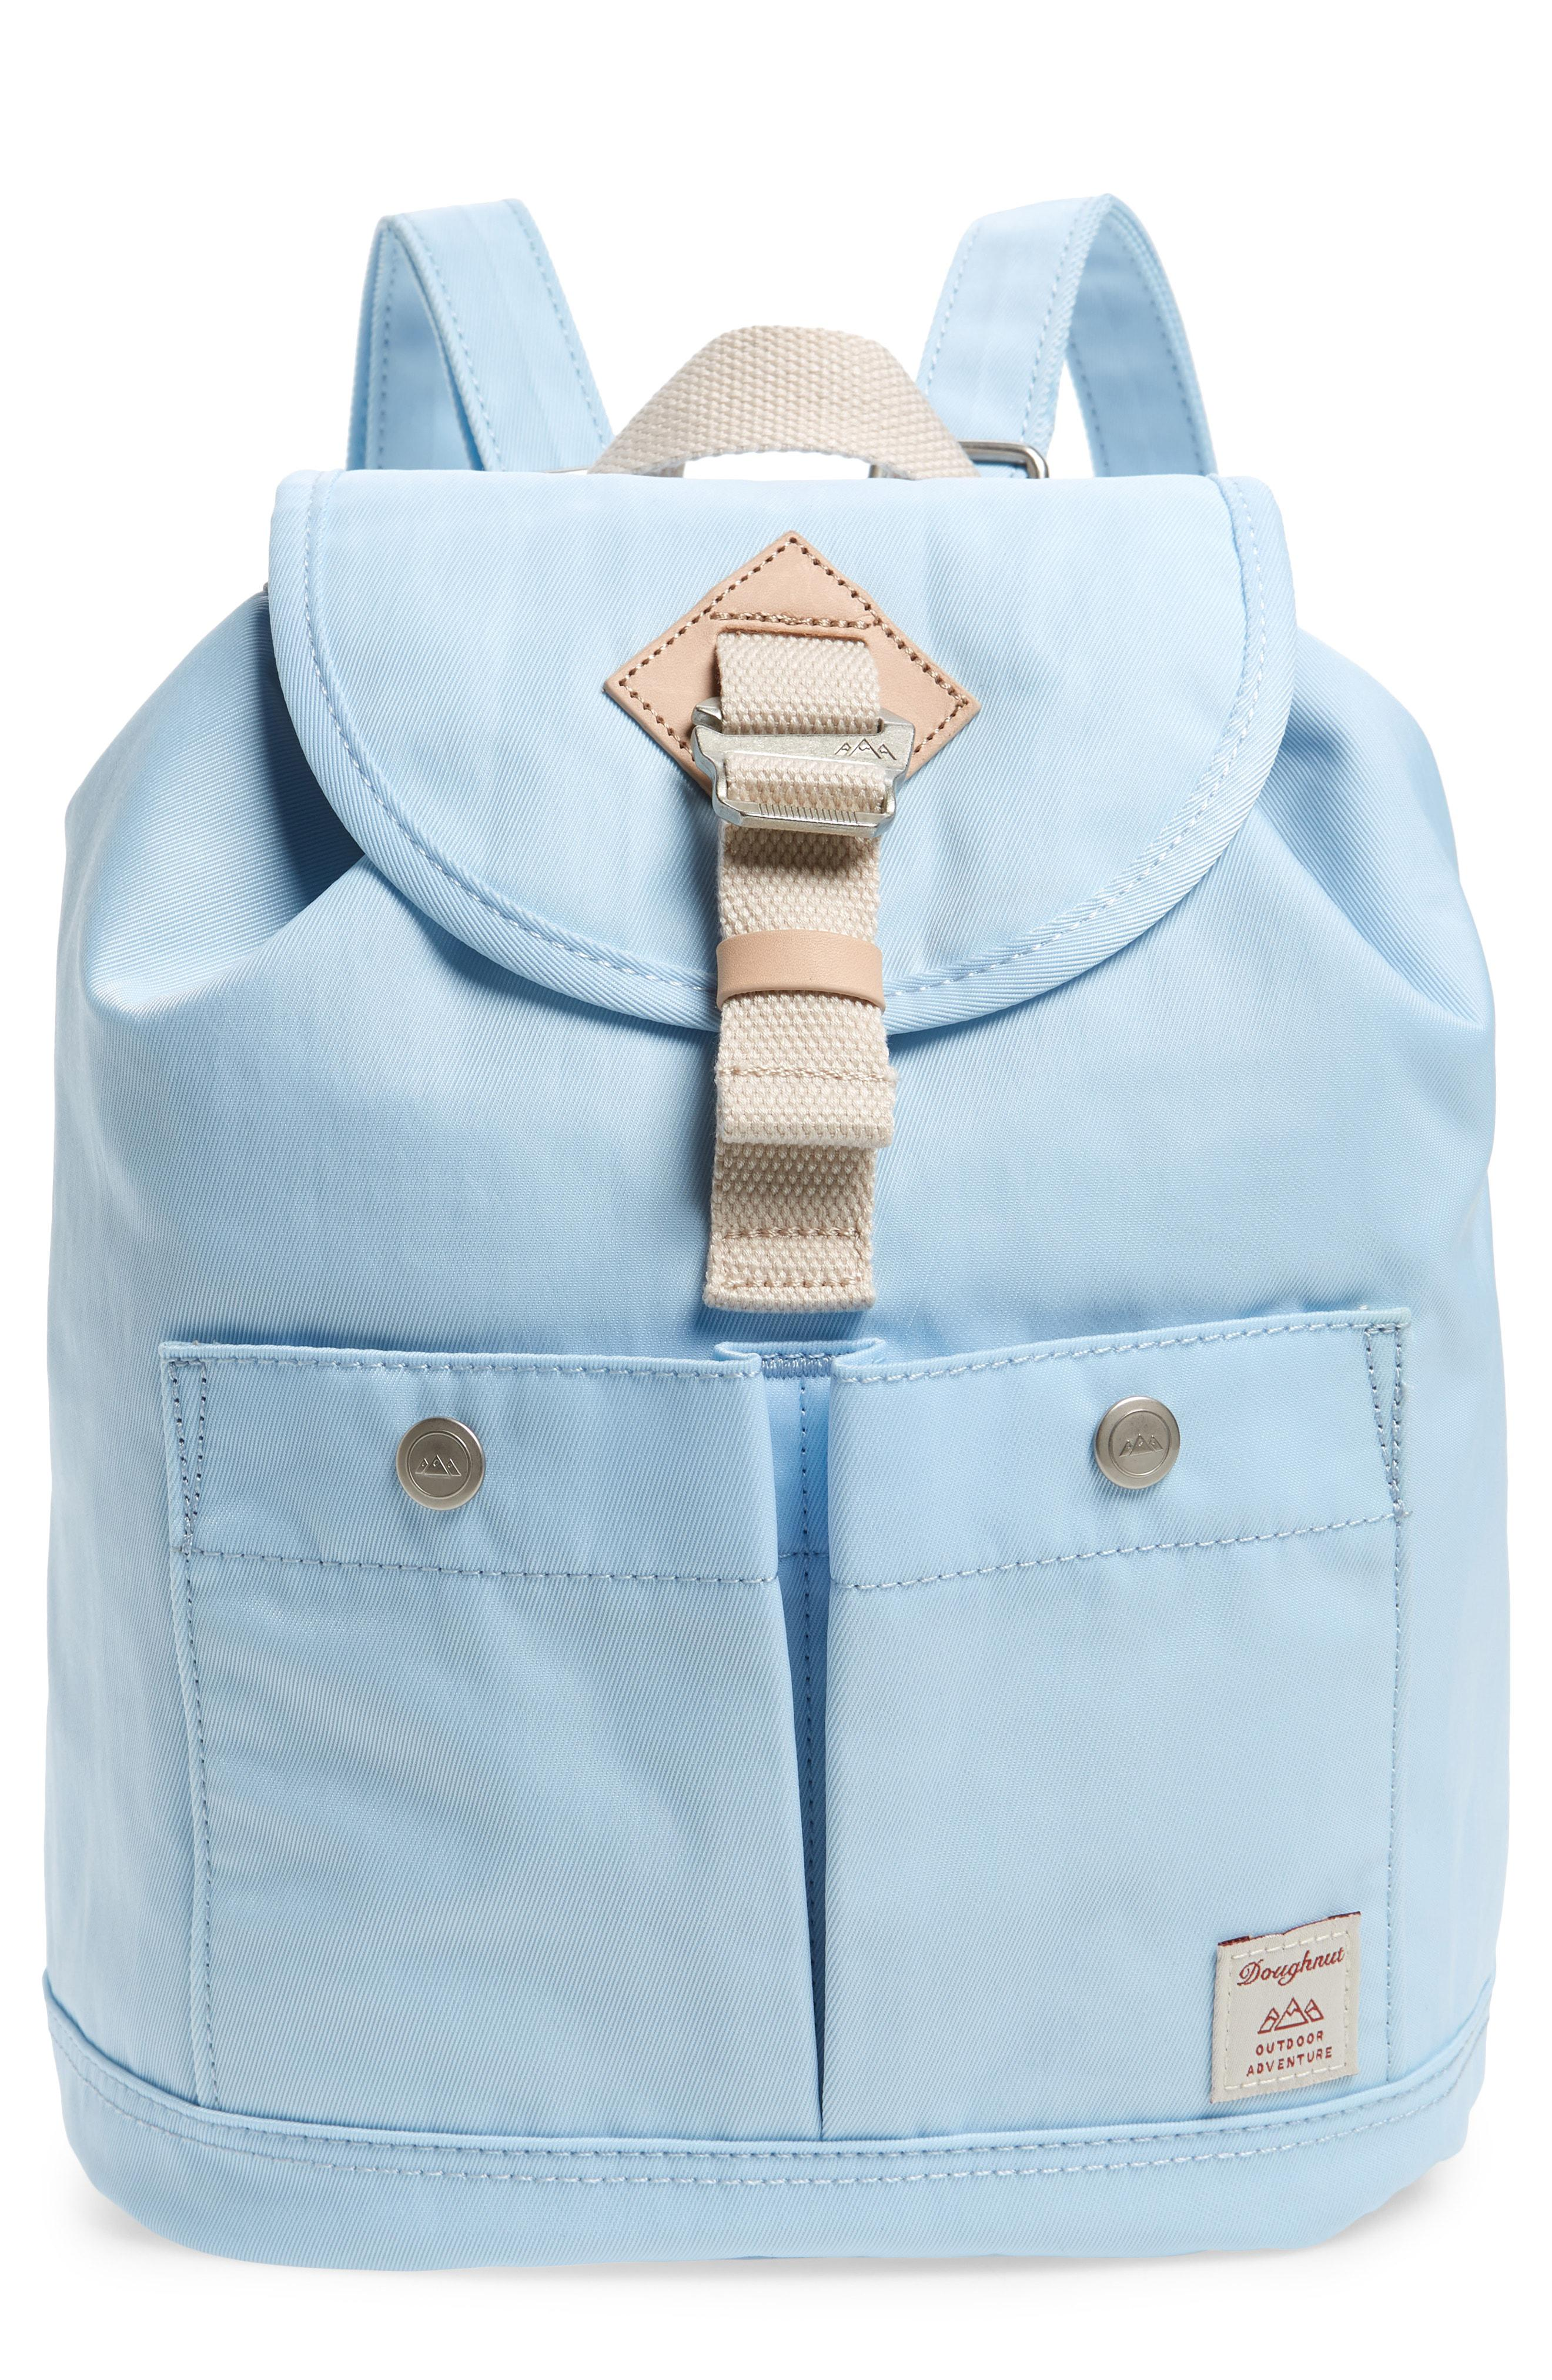 088e4b55d732 Doughnut - Blue Mini Montana Water Repellent Backpack - Lyst. View  fullscreen